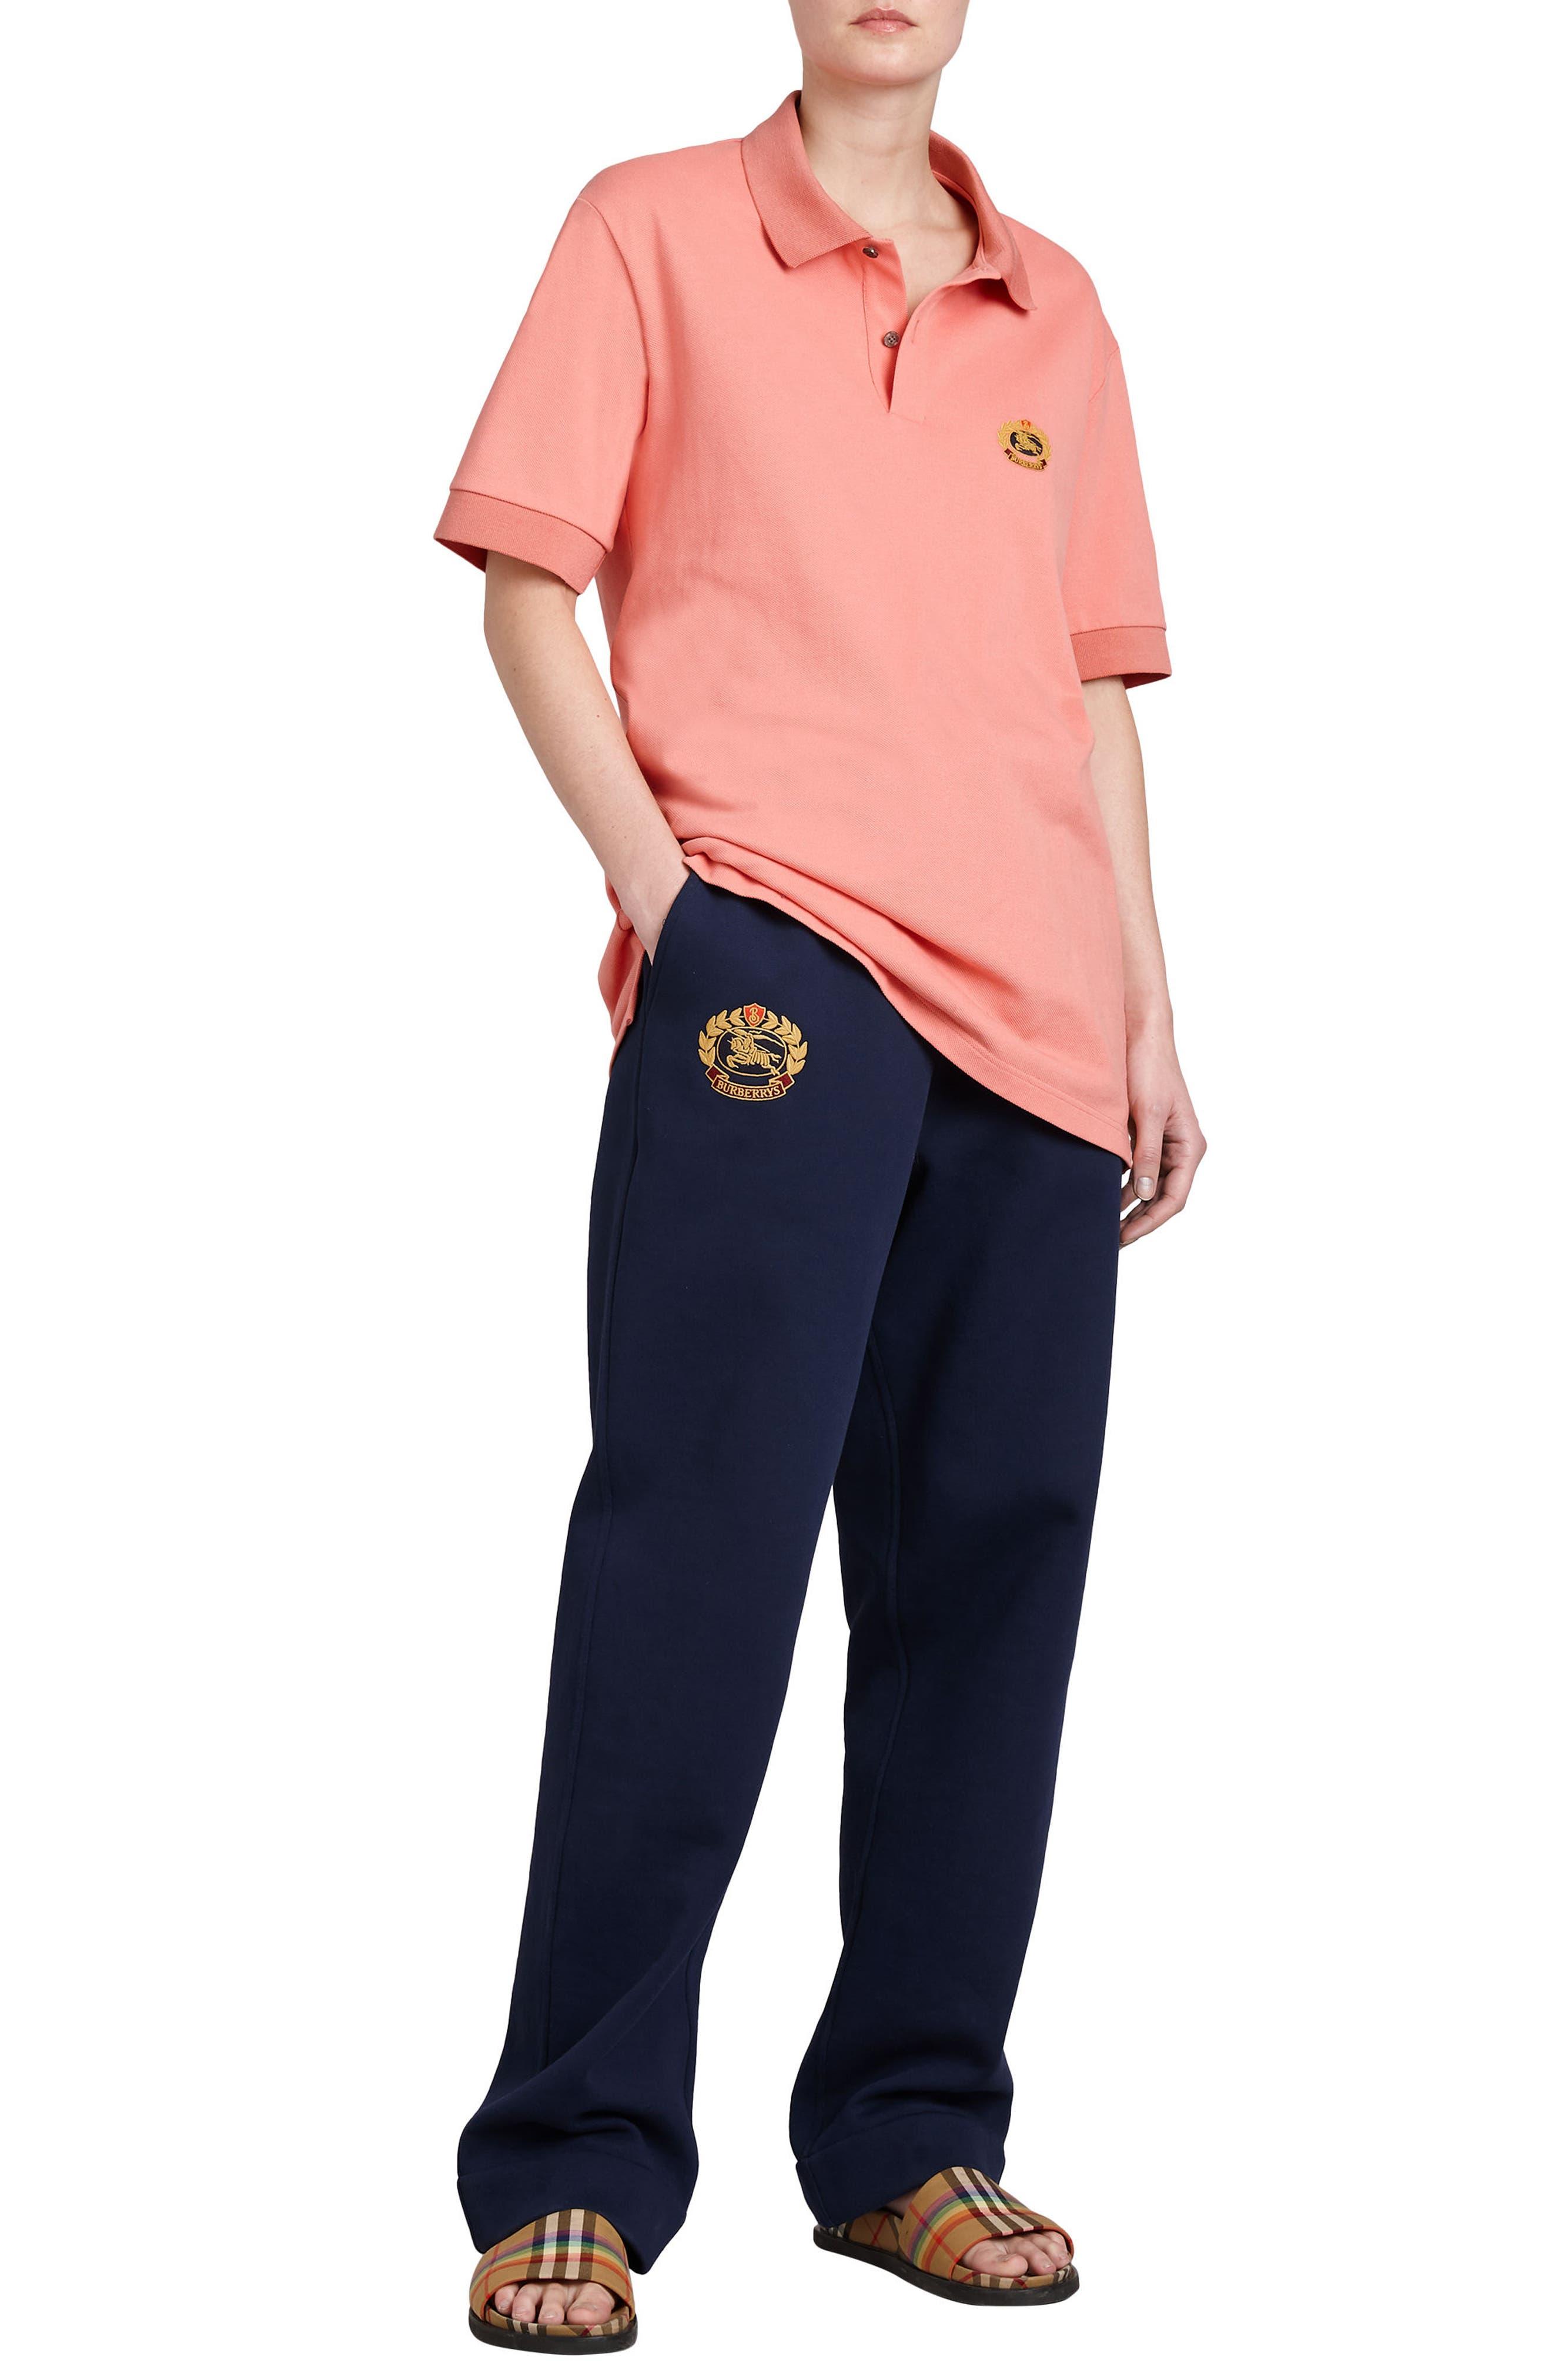 Vintage Crest Sweatpants,                             Alternate thumbnail 5, color,                             Midnight Blue